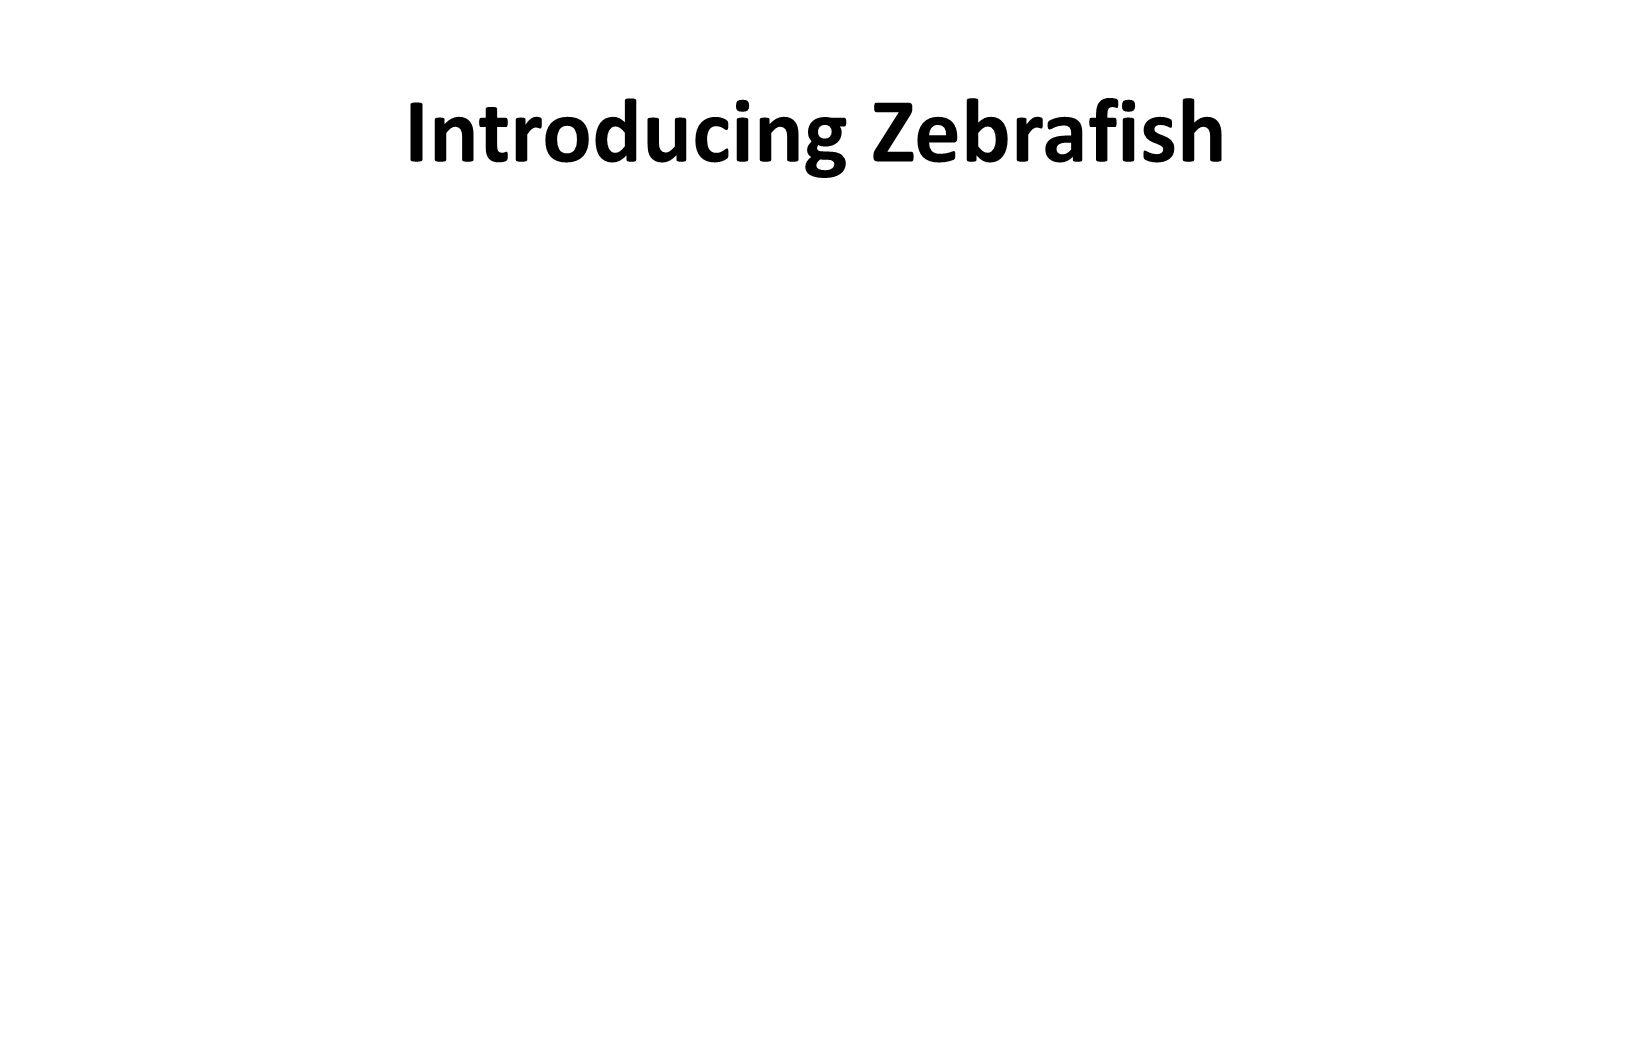 Introducing Zebrafish